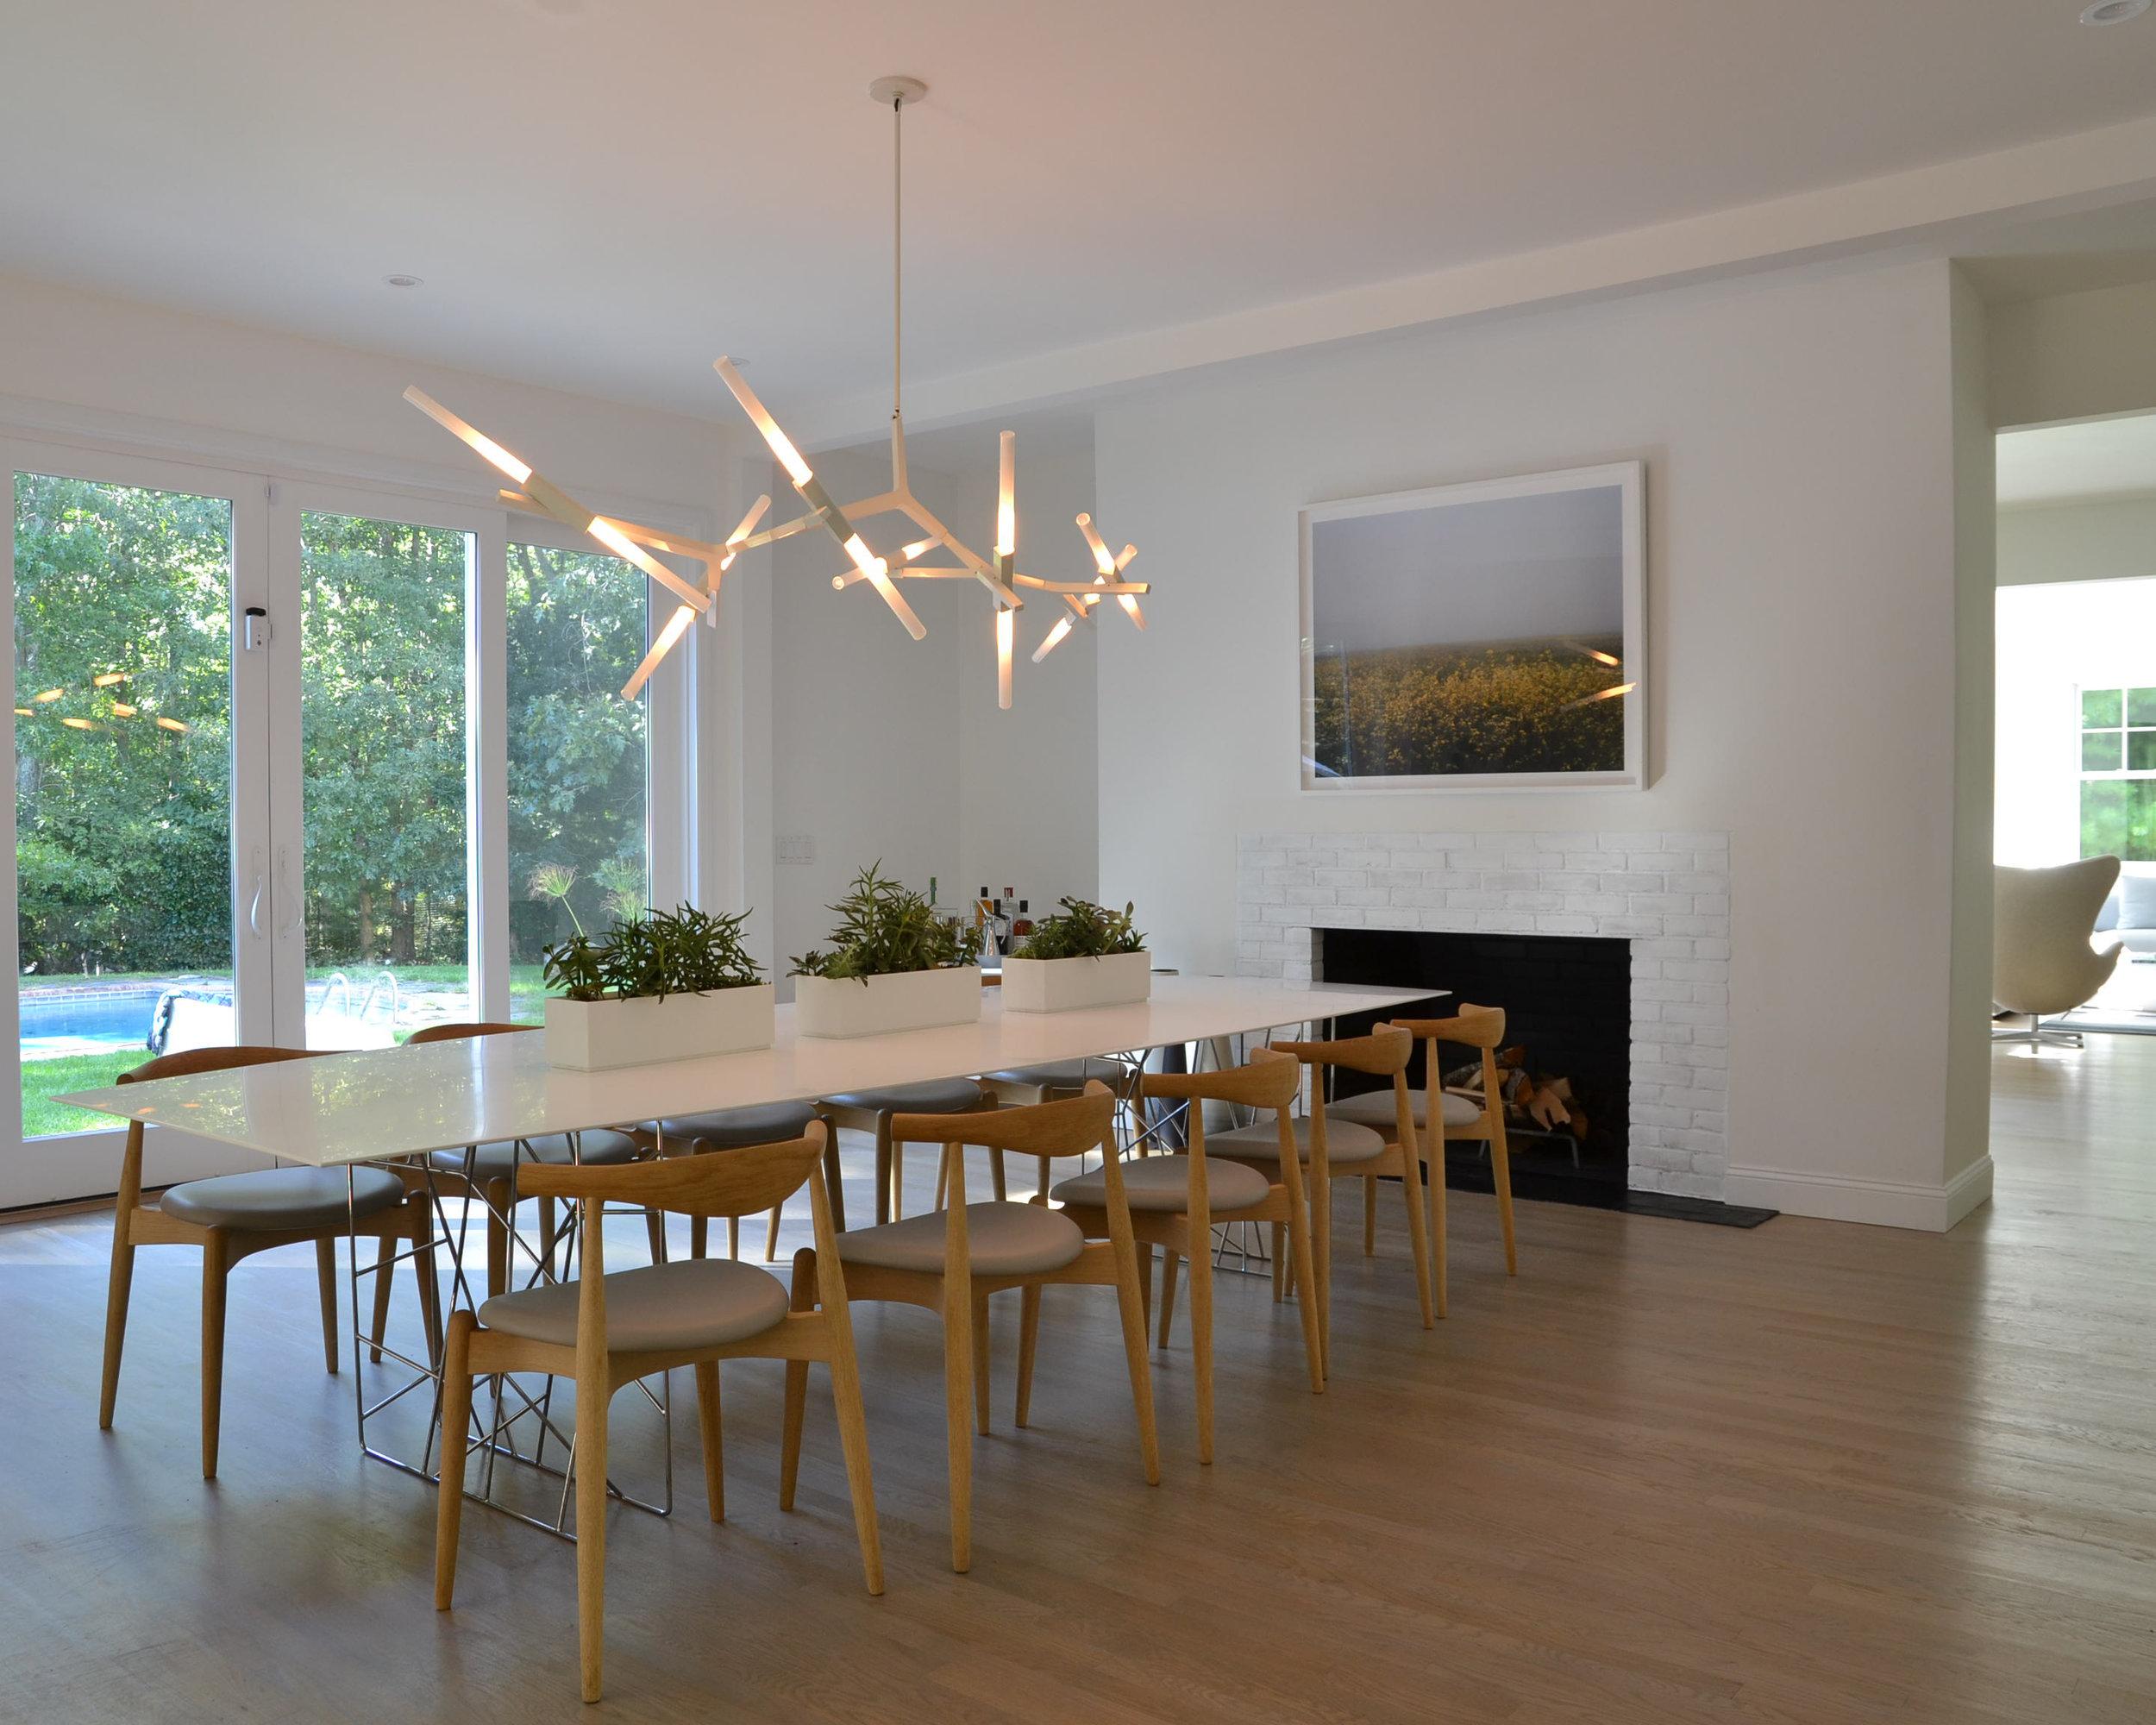 15.012 summer |East Hampton, New York | Interior Design:West Chin.